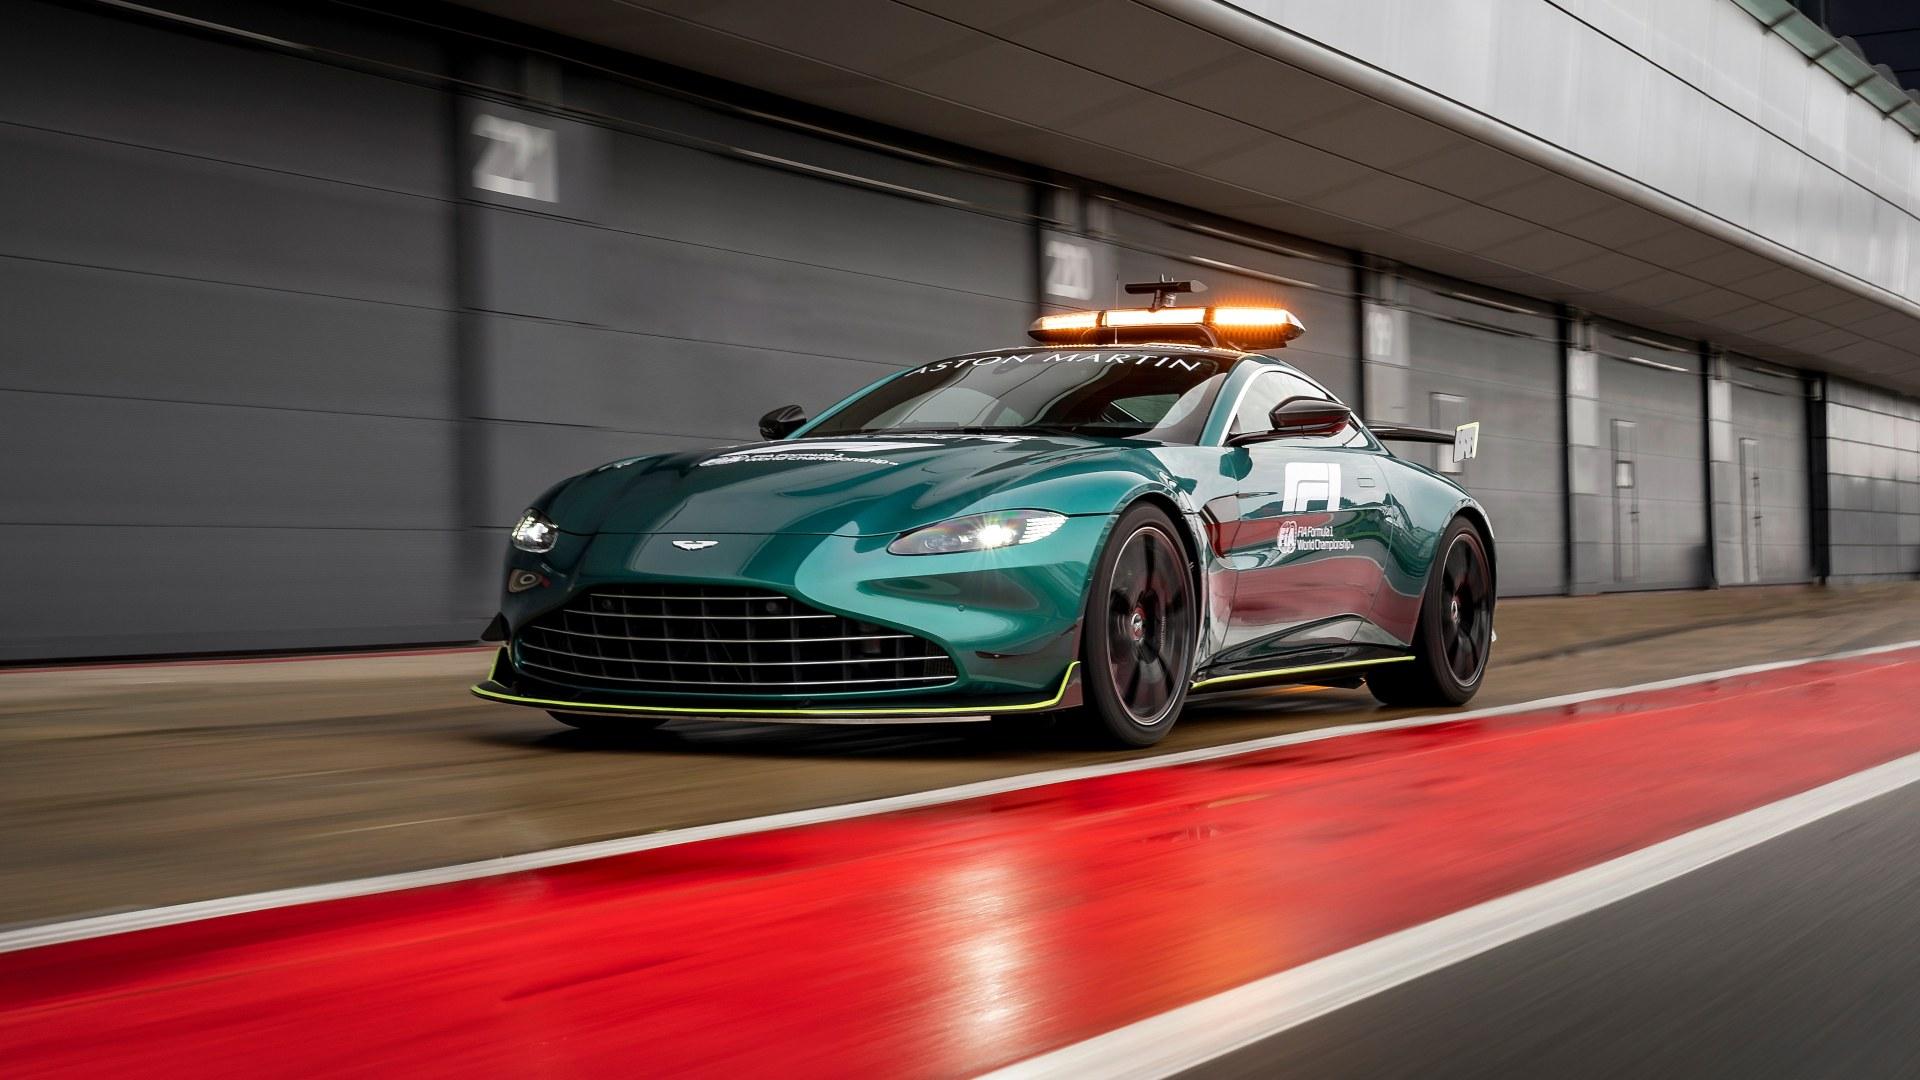 Aston Martin VantageOfficial Safety Car of Formula One01